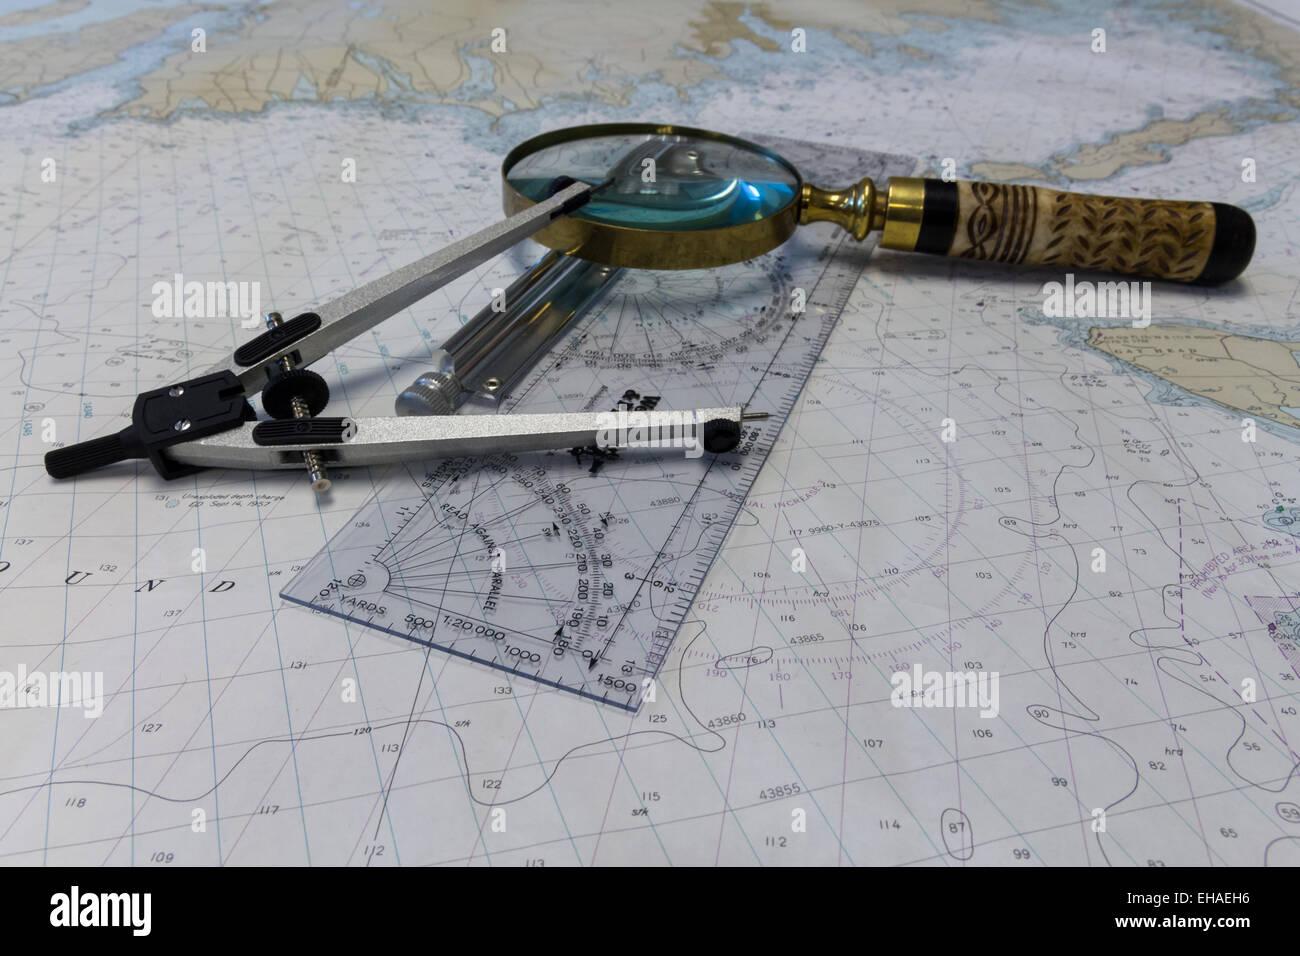 navigation tools and map - Stock Image